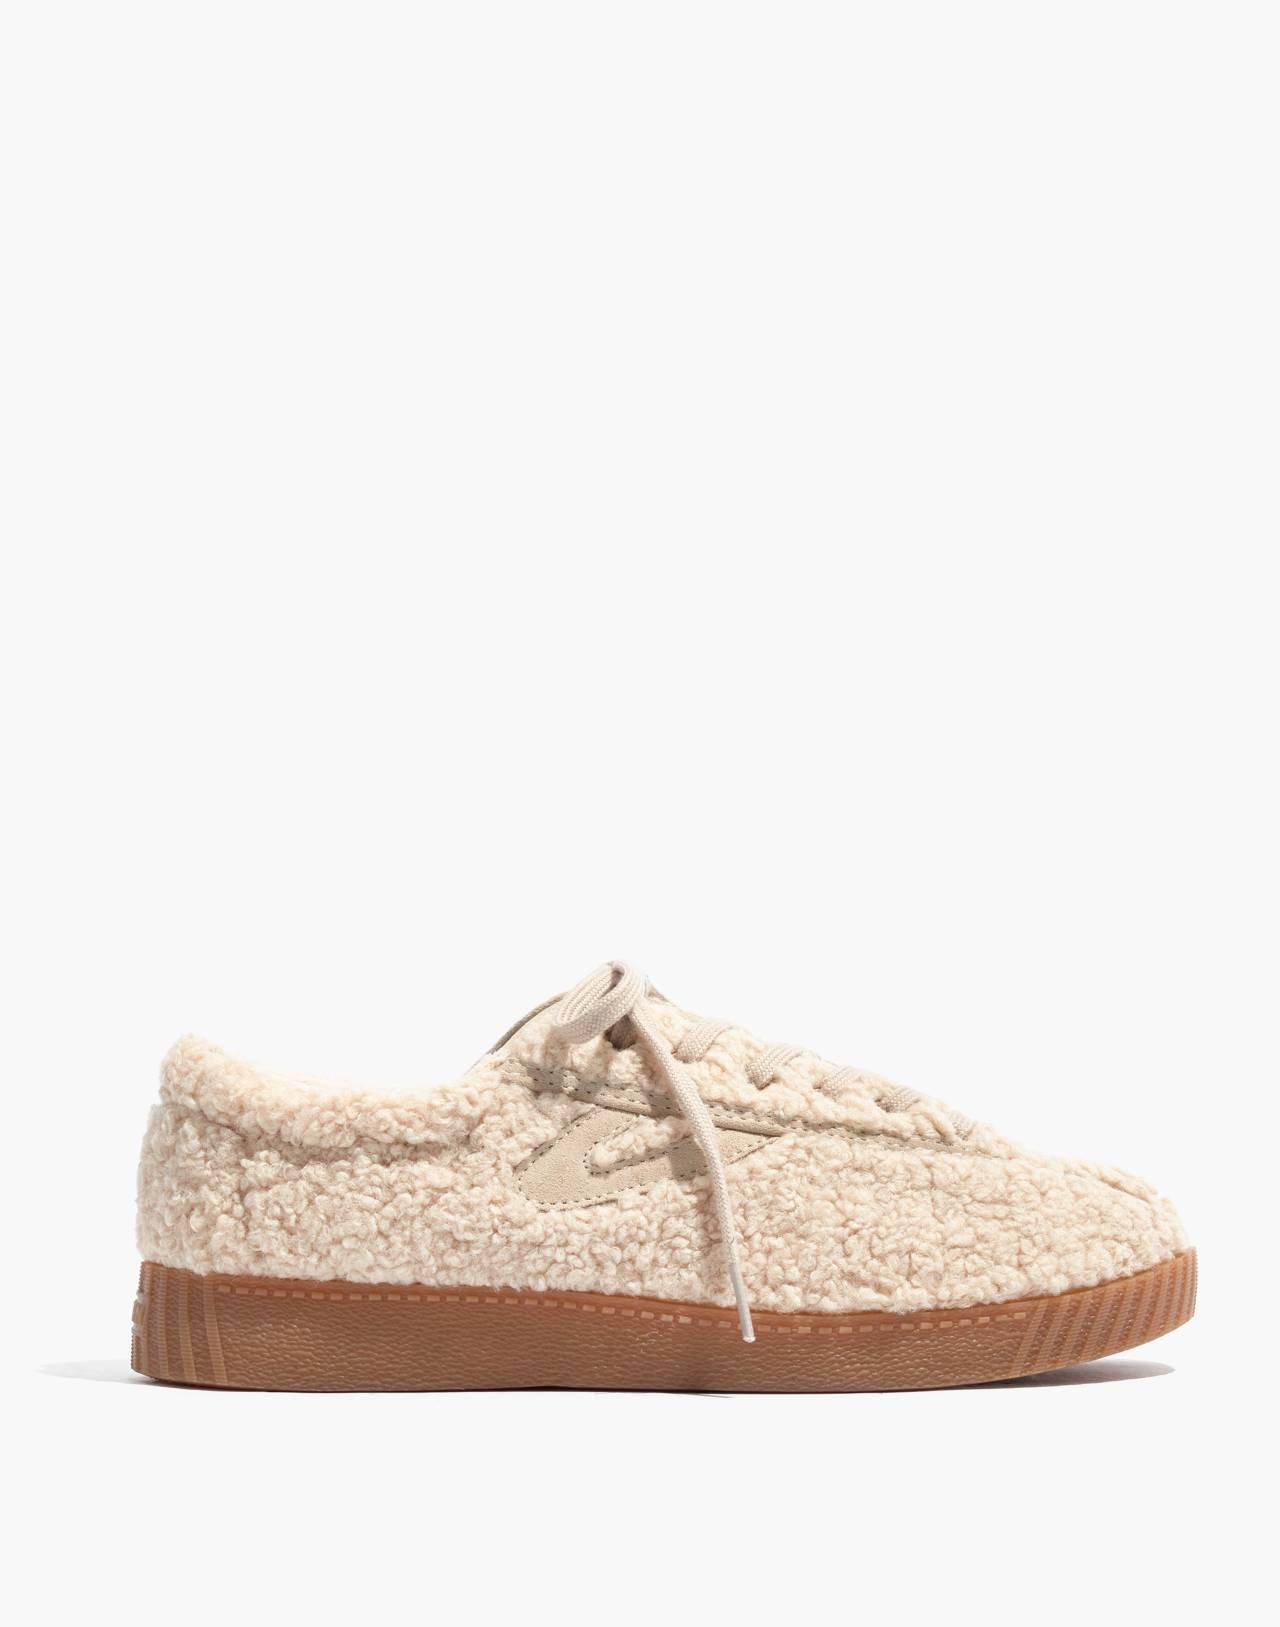 Tretorn® Nylite Plus Sneakers in Cream Faux Shearling in cream image 2